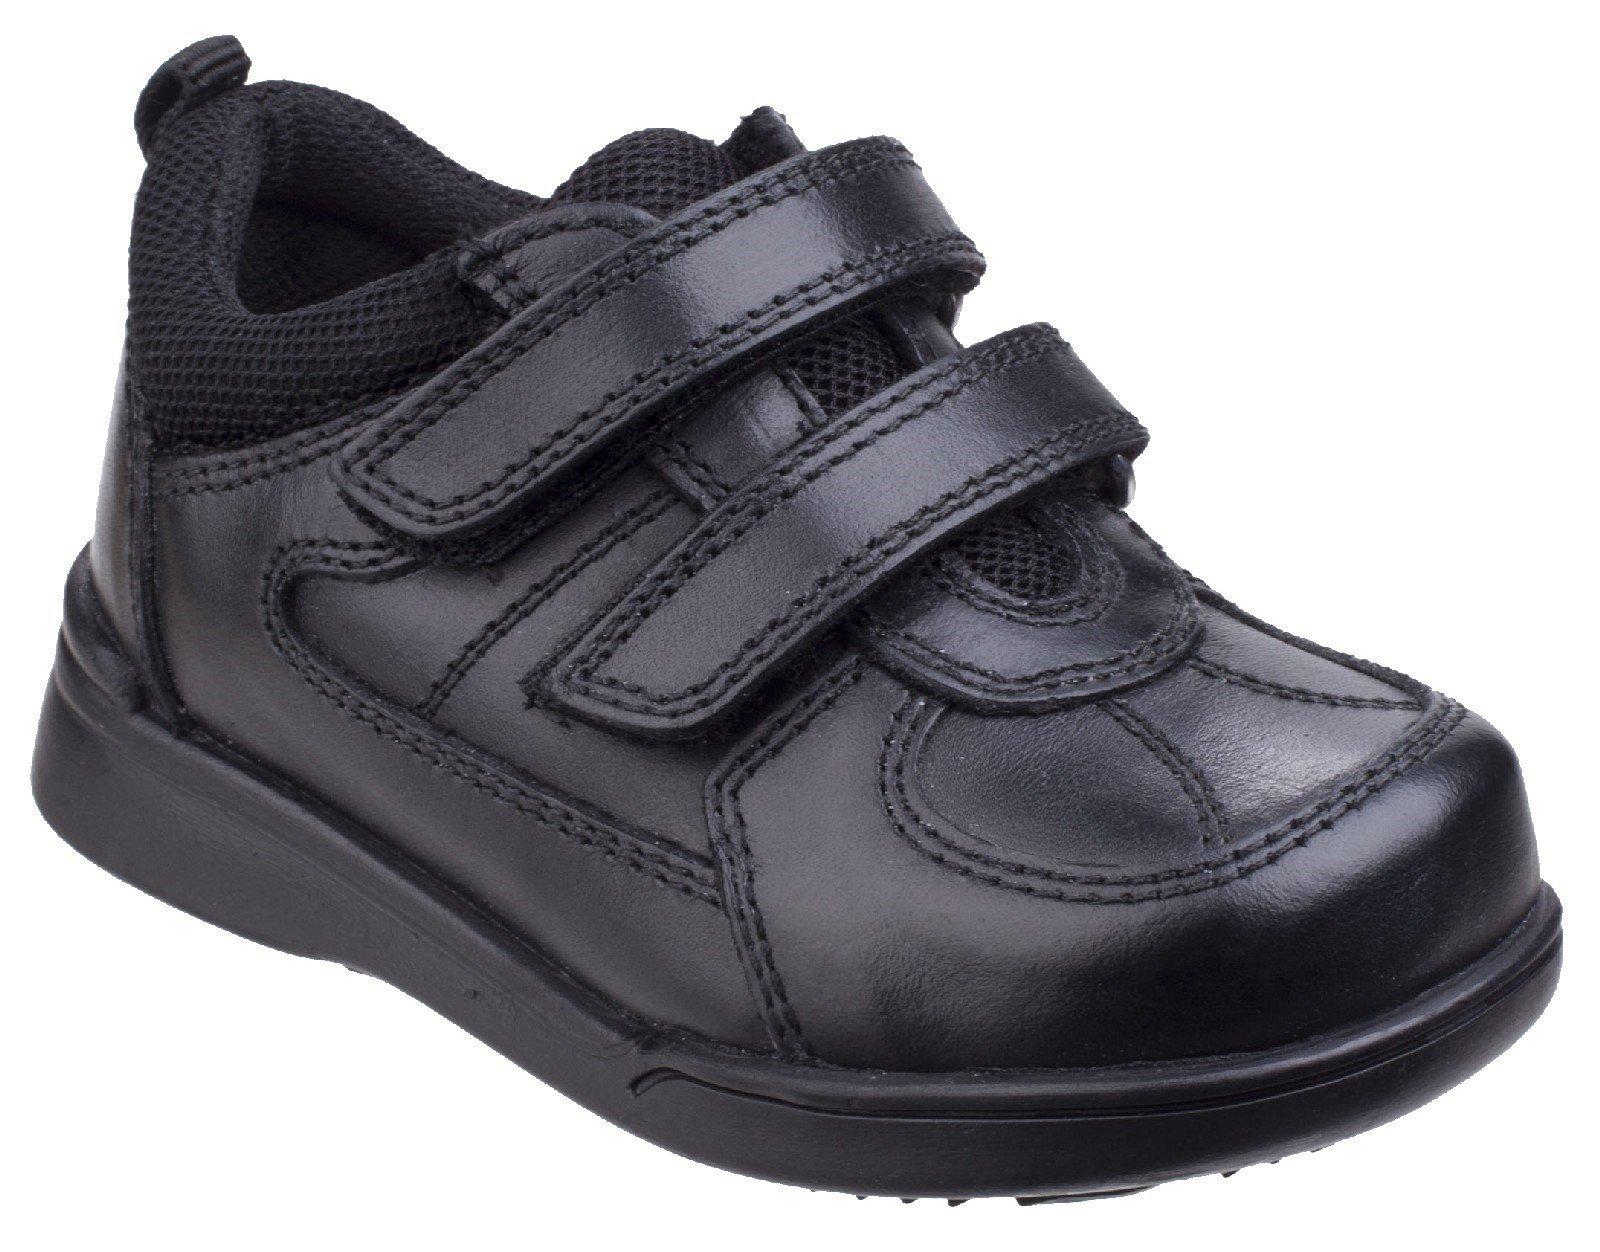 Hush Puppies Men's Liam School Shoe Black 25672 - Black 9